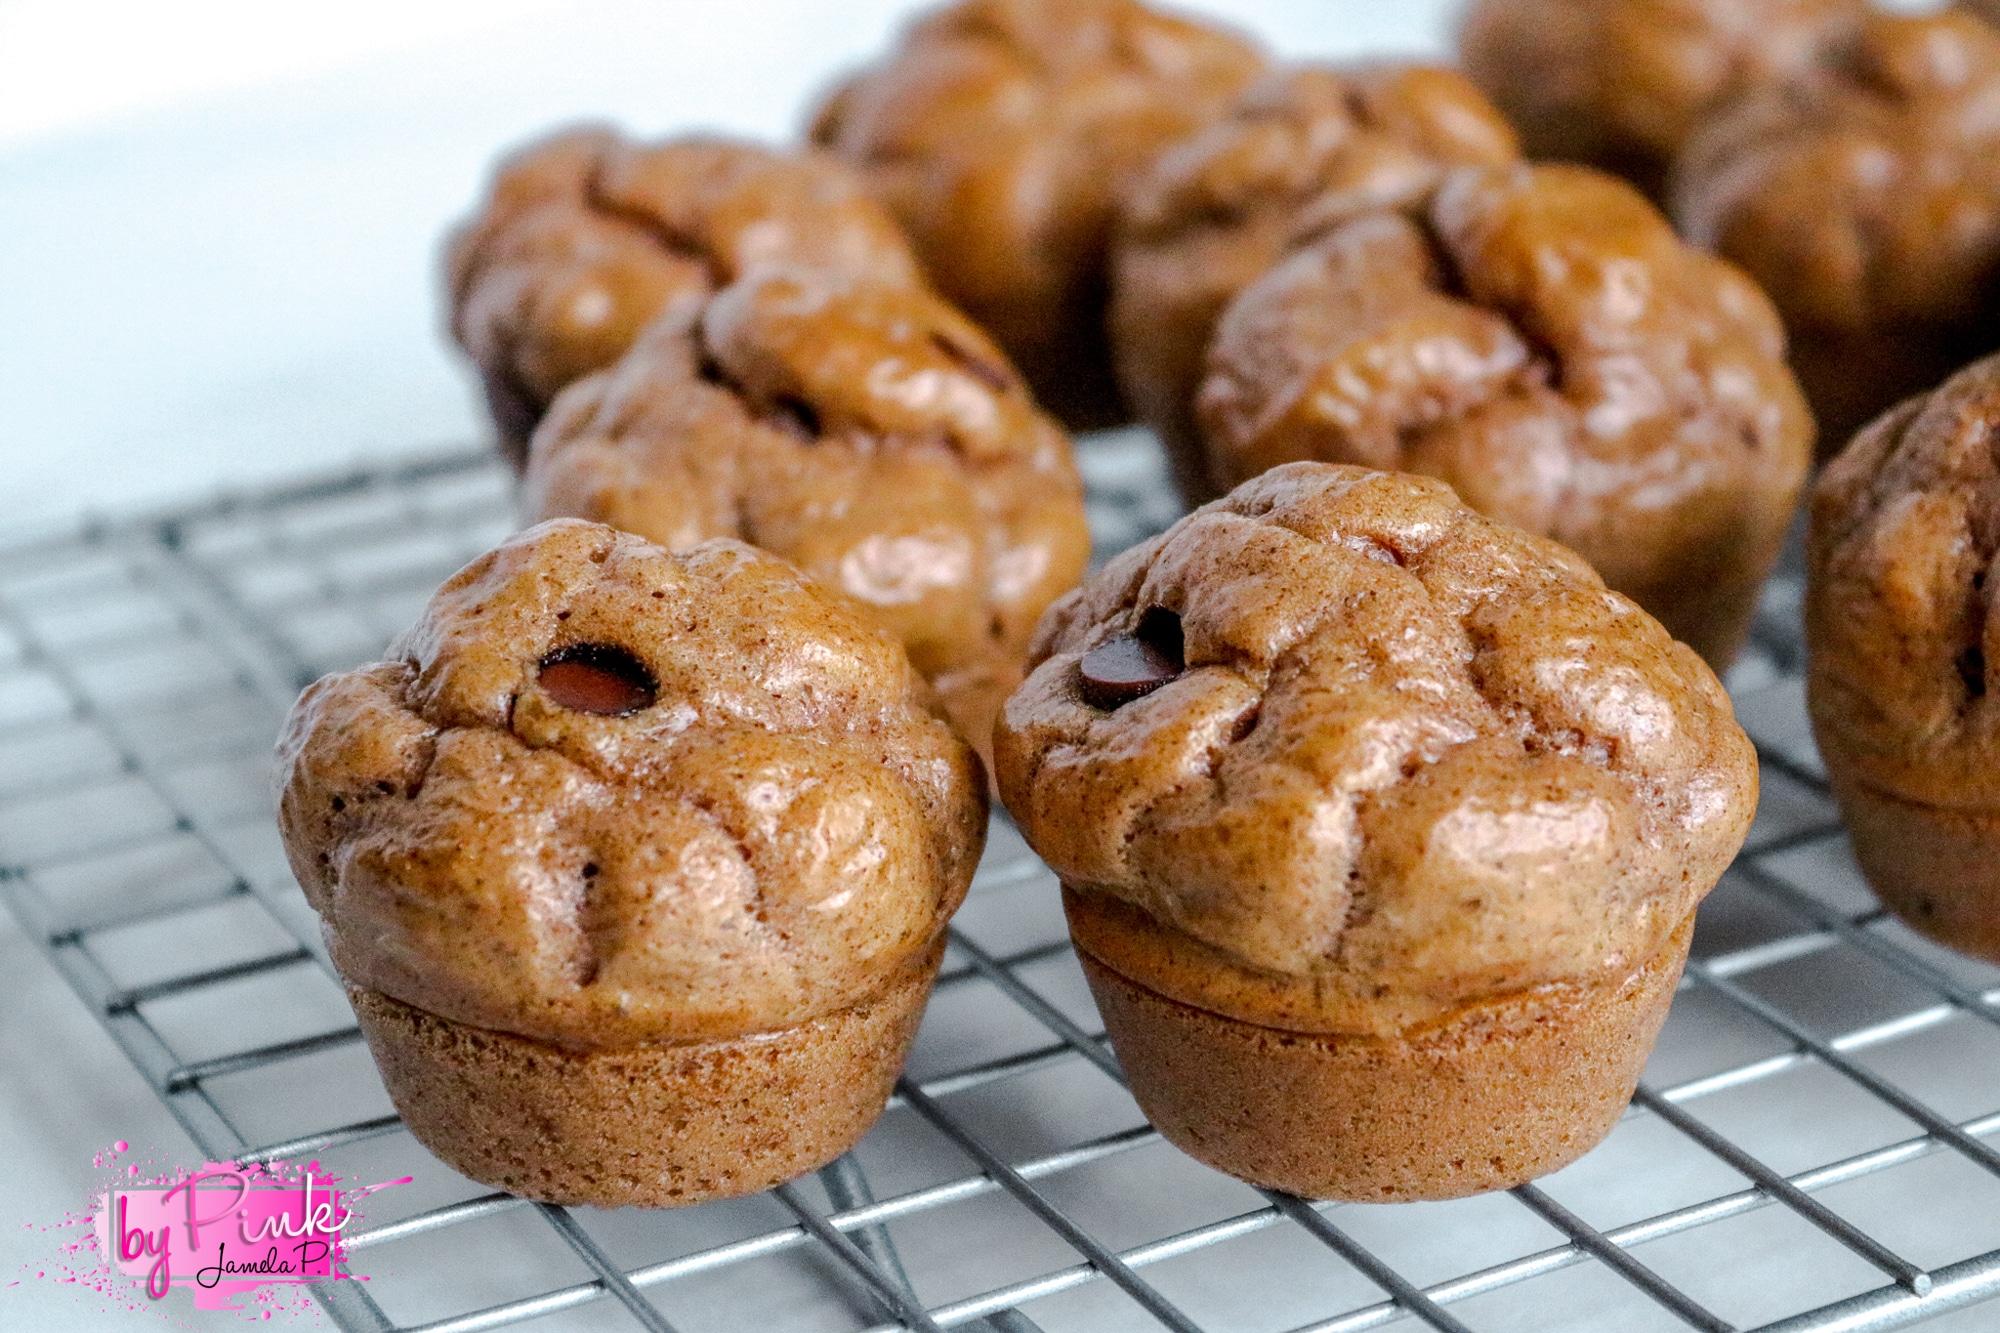 keto friendly muffins